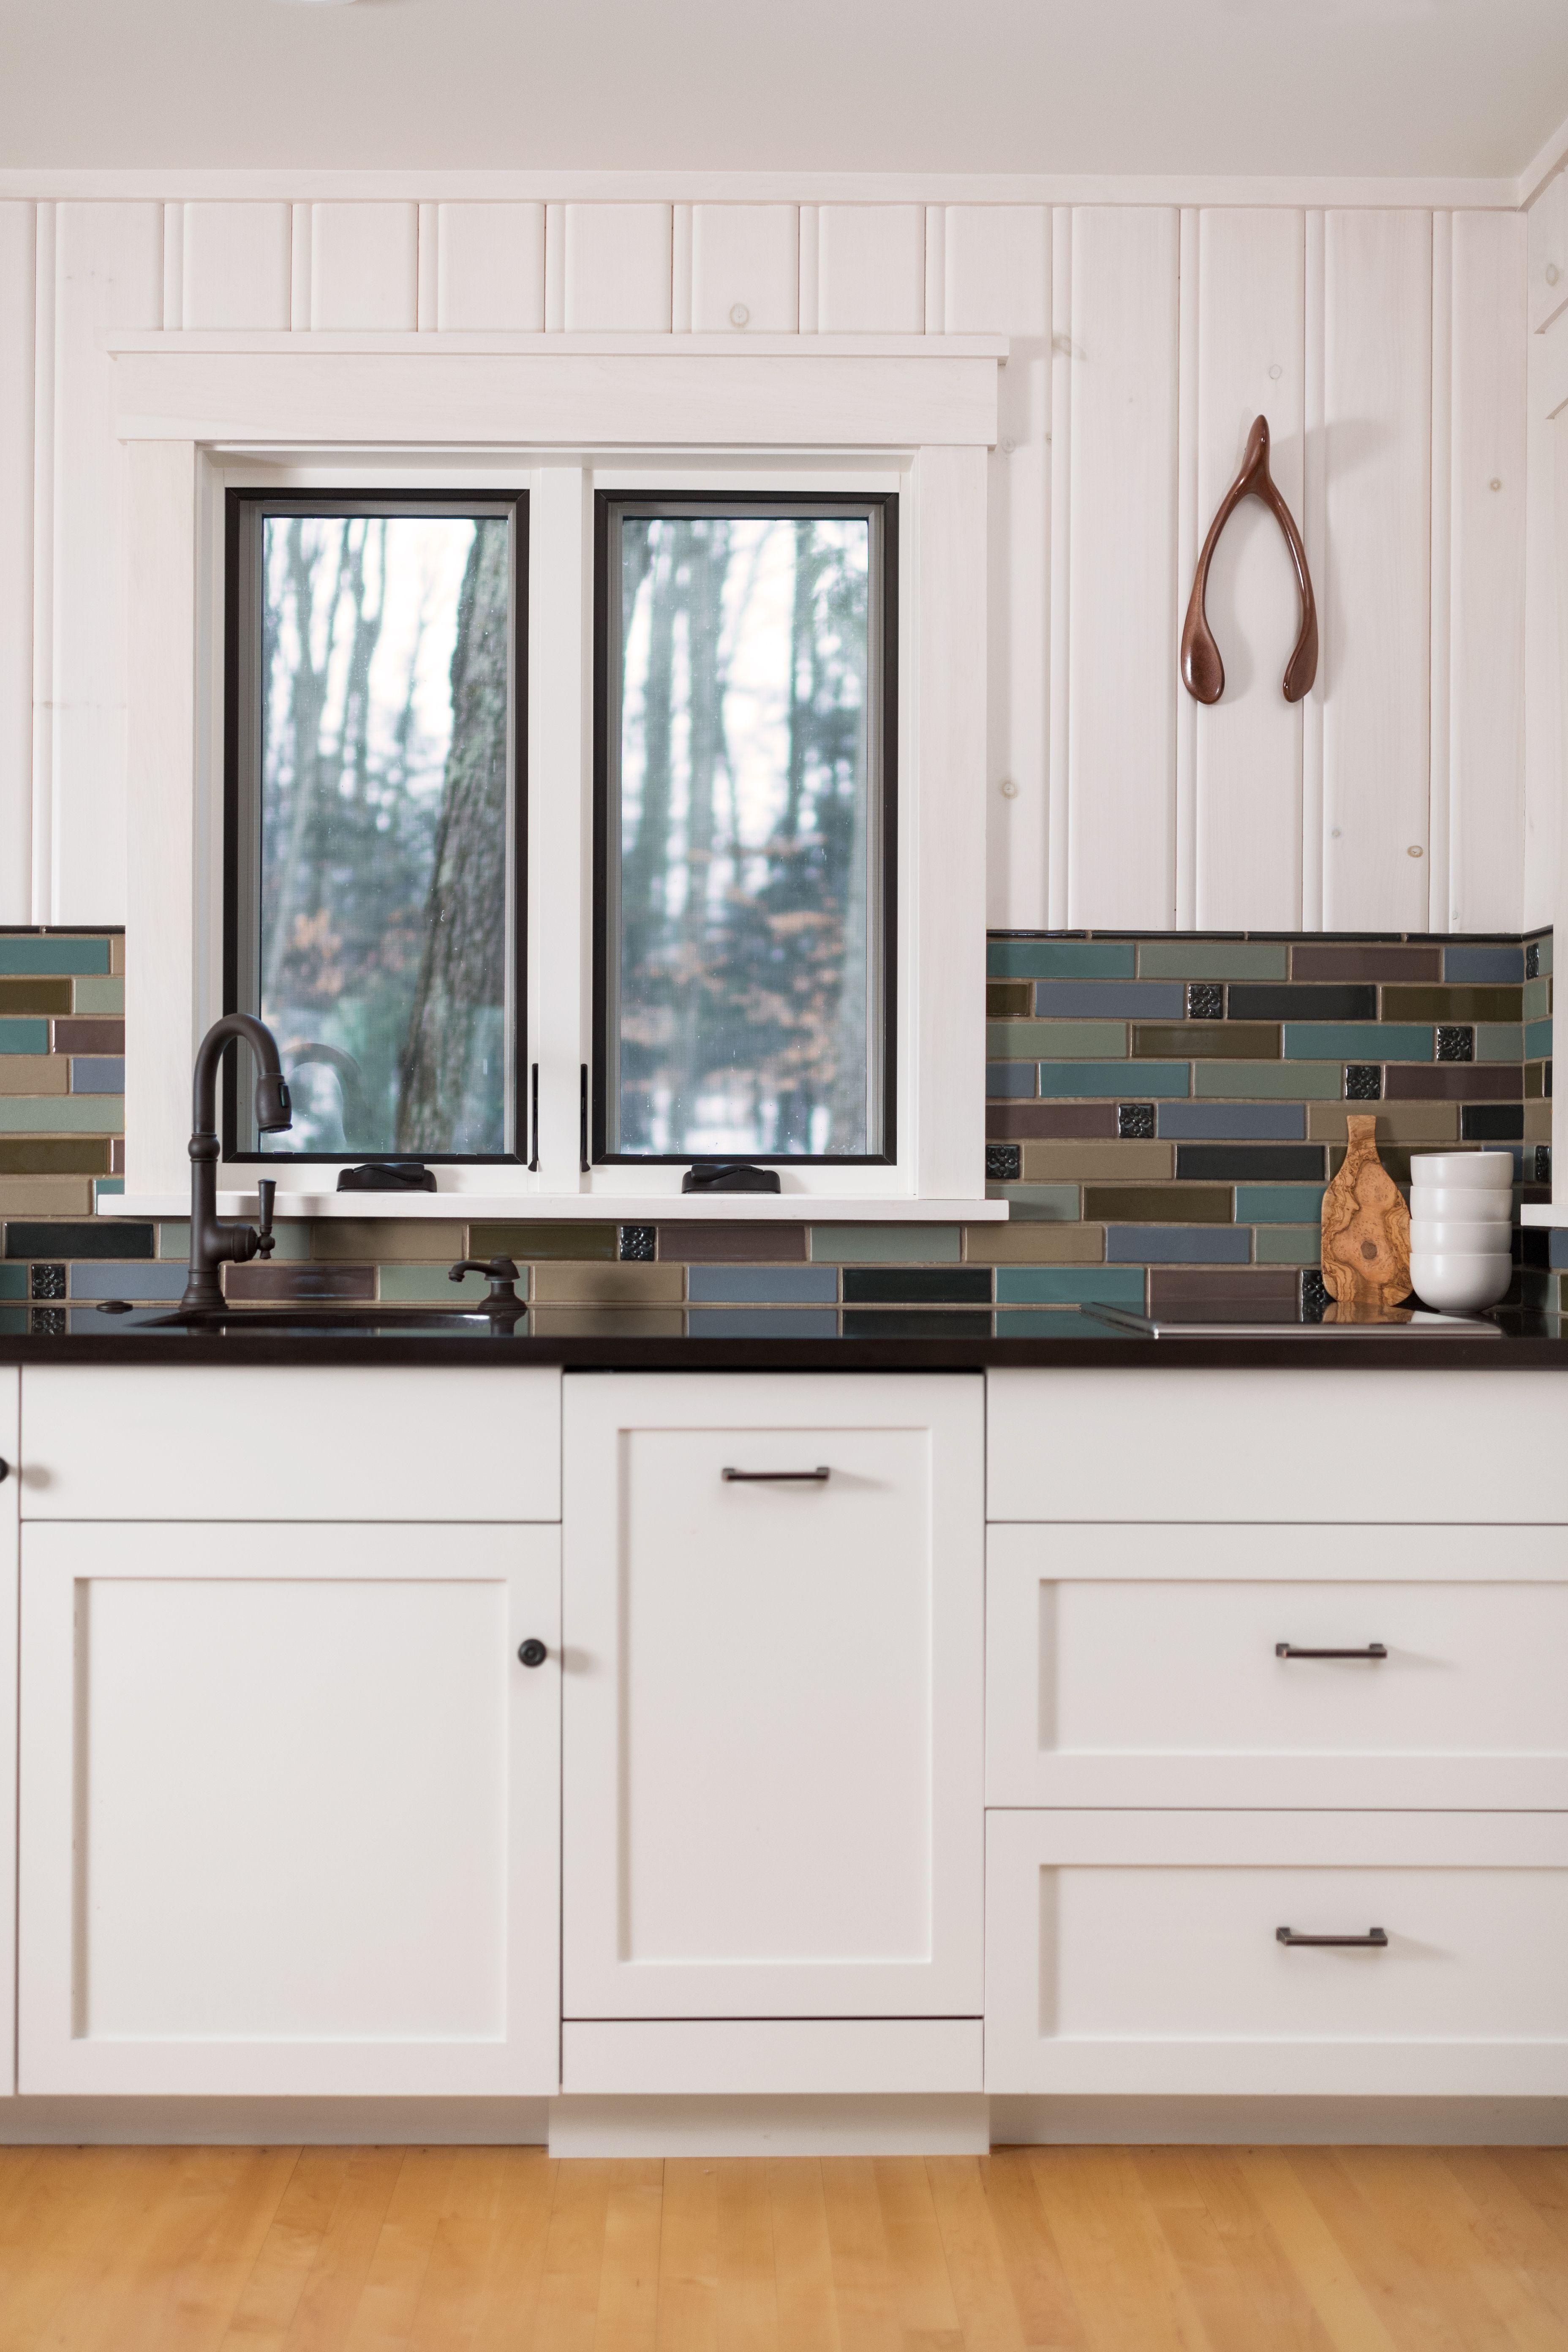 Craftsman Style Kitchen Featuring Warm Neutral Tile Backsplash Rookwood Tile In 2020 Kitchen Inspirations Craftsman Style Kitchen Inspiring Spaces